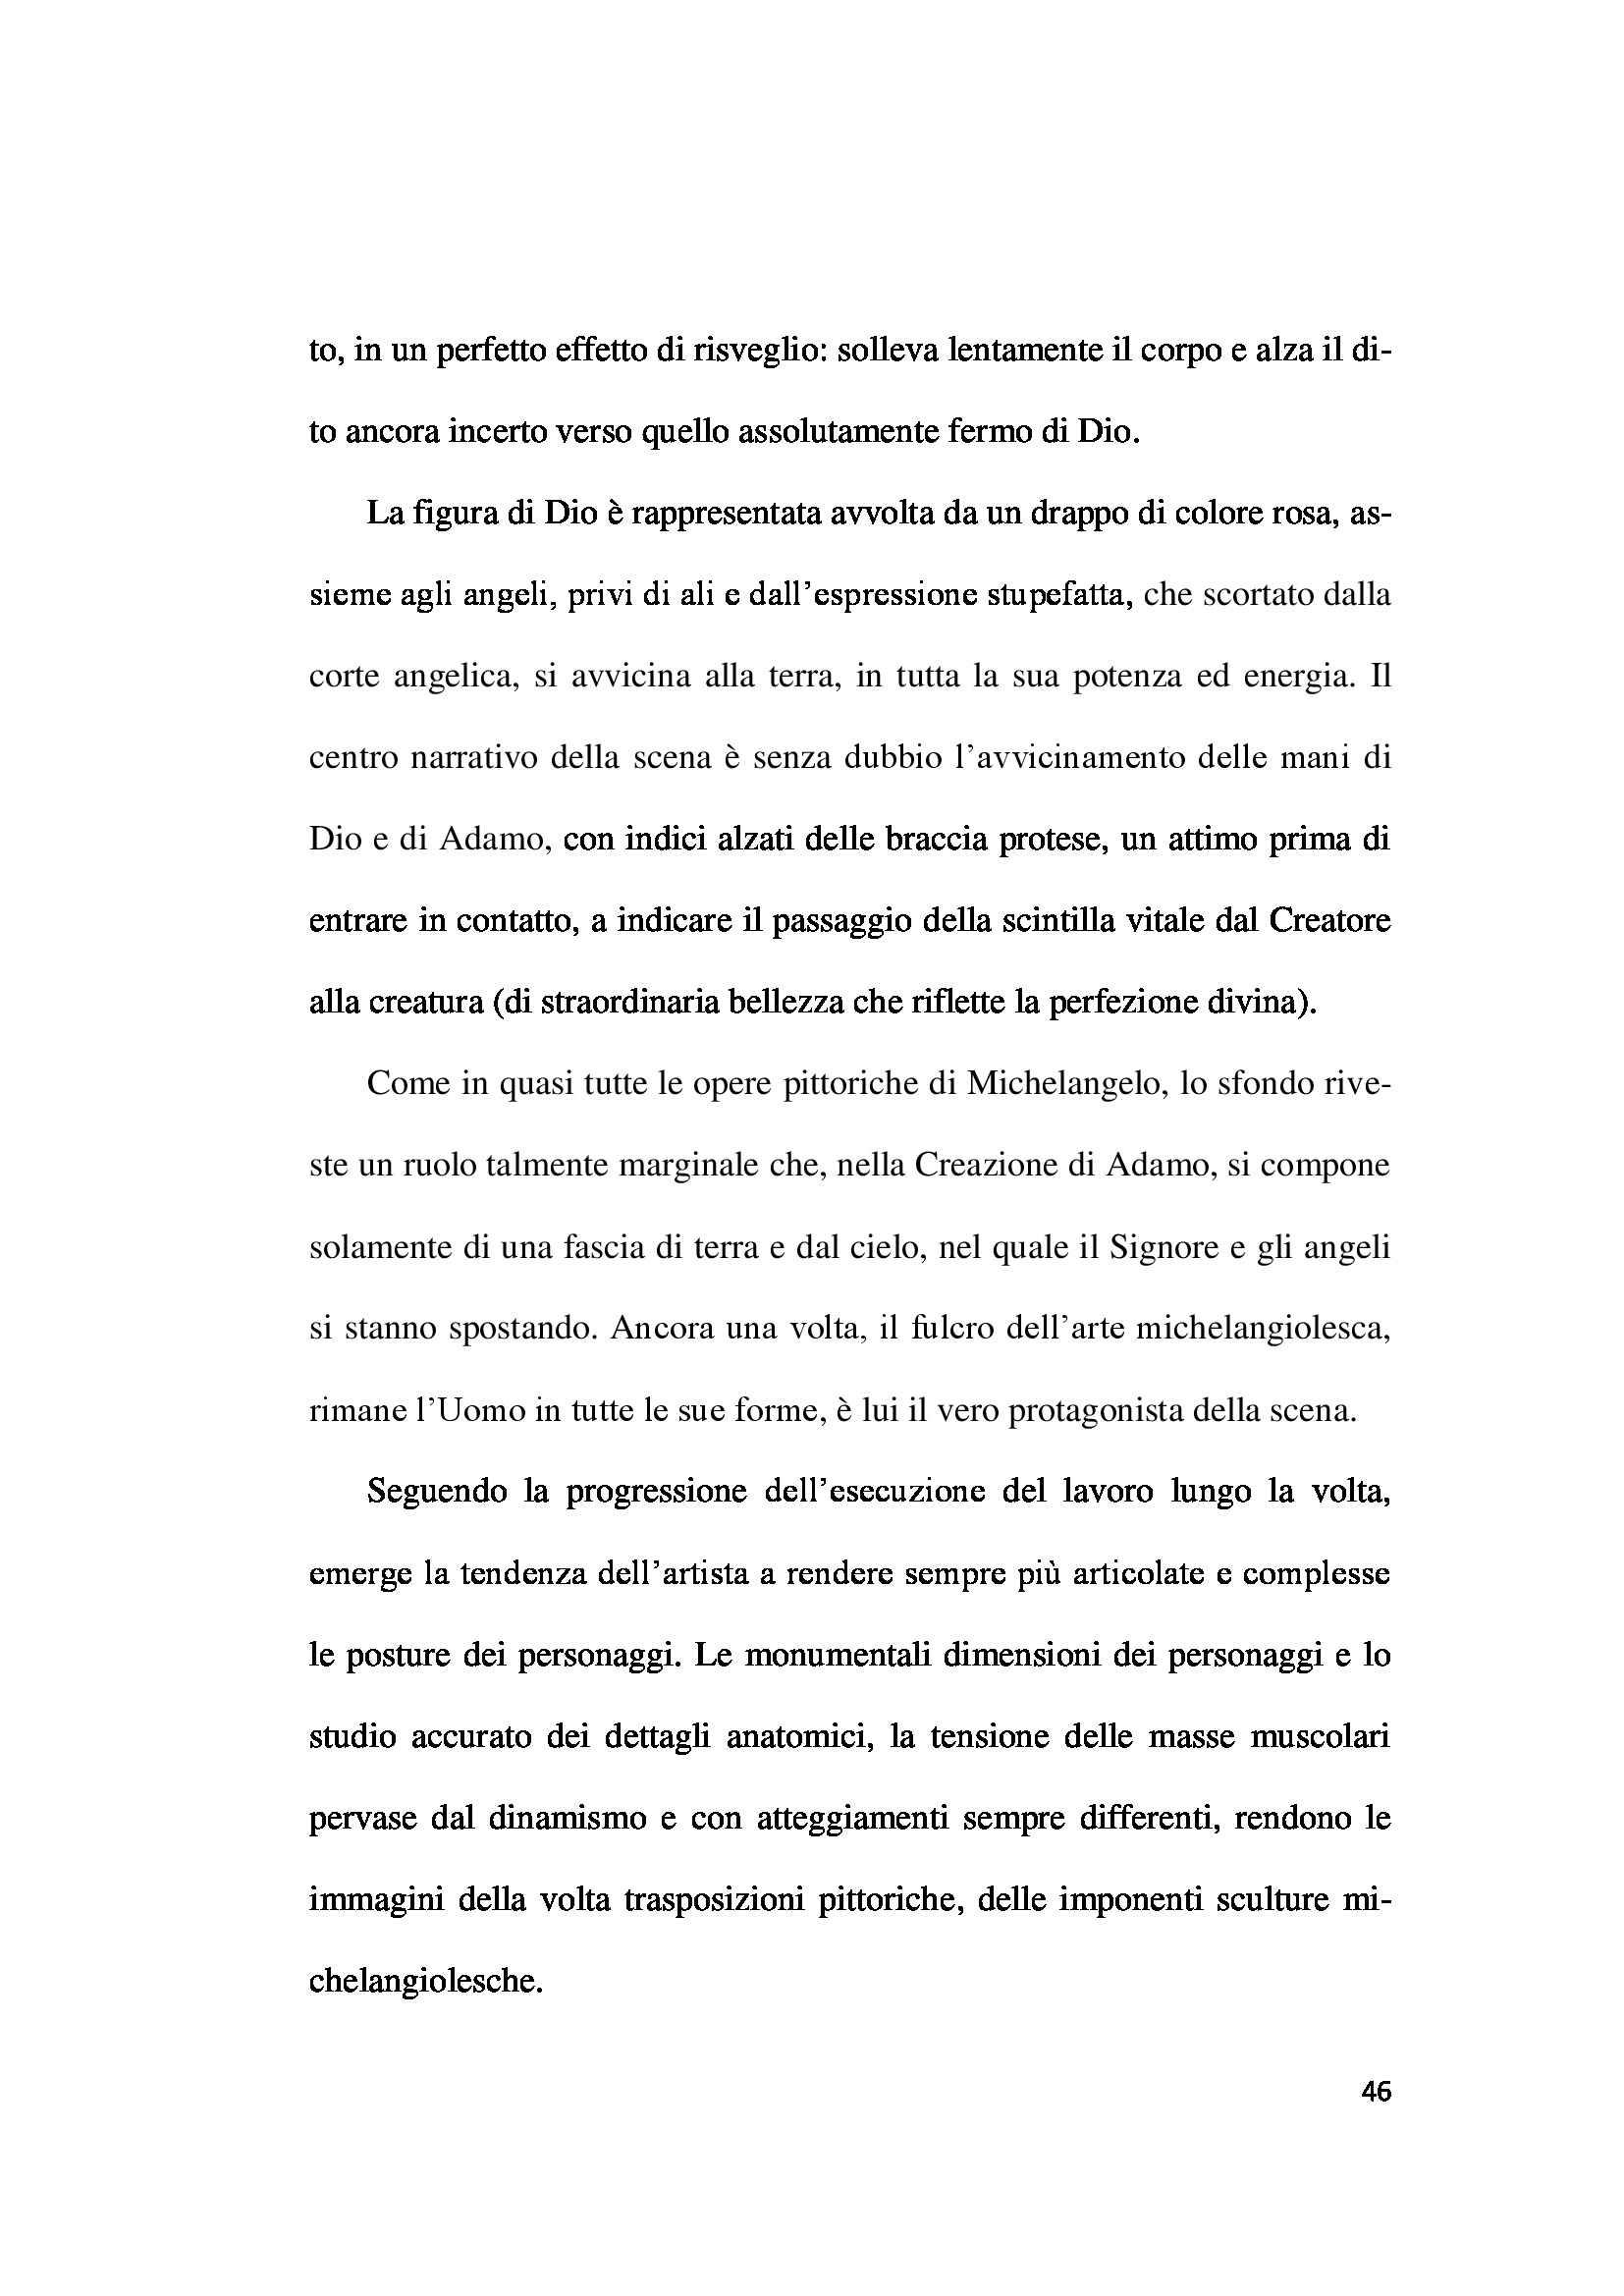 Tesi - Cappella Sistina Pag. 46